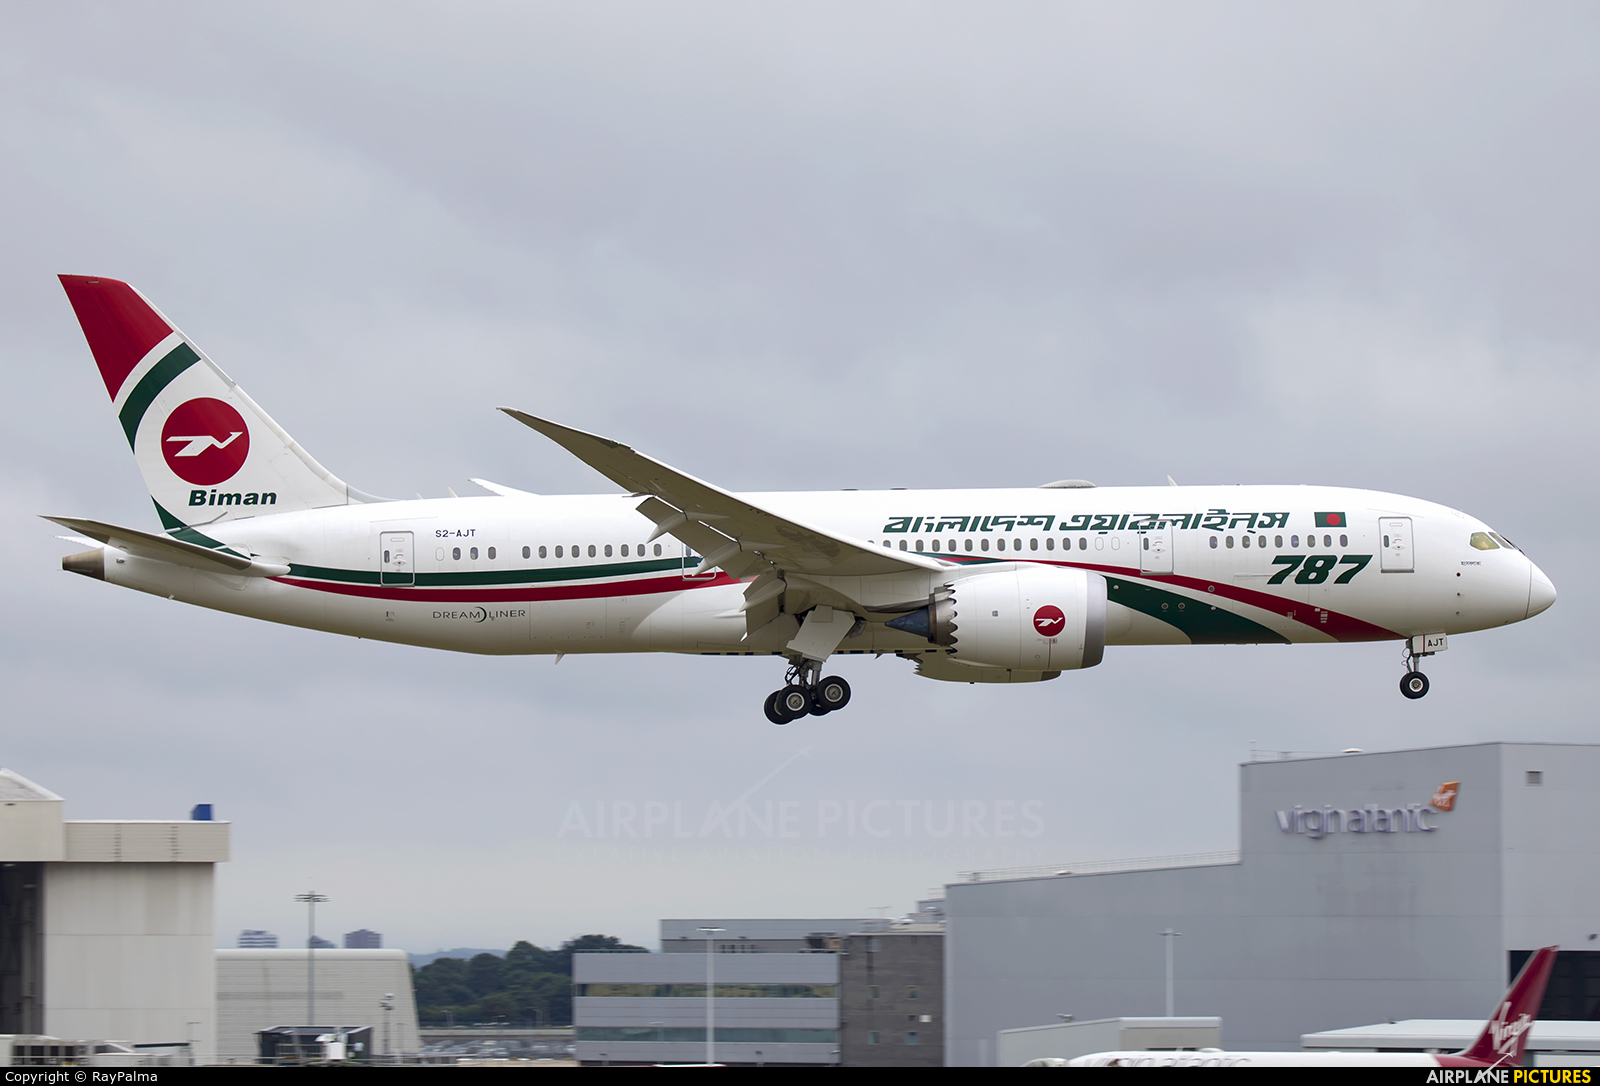 Biman Bangladesh S2-AJT aircraft at London - Heathrow